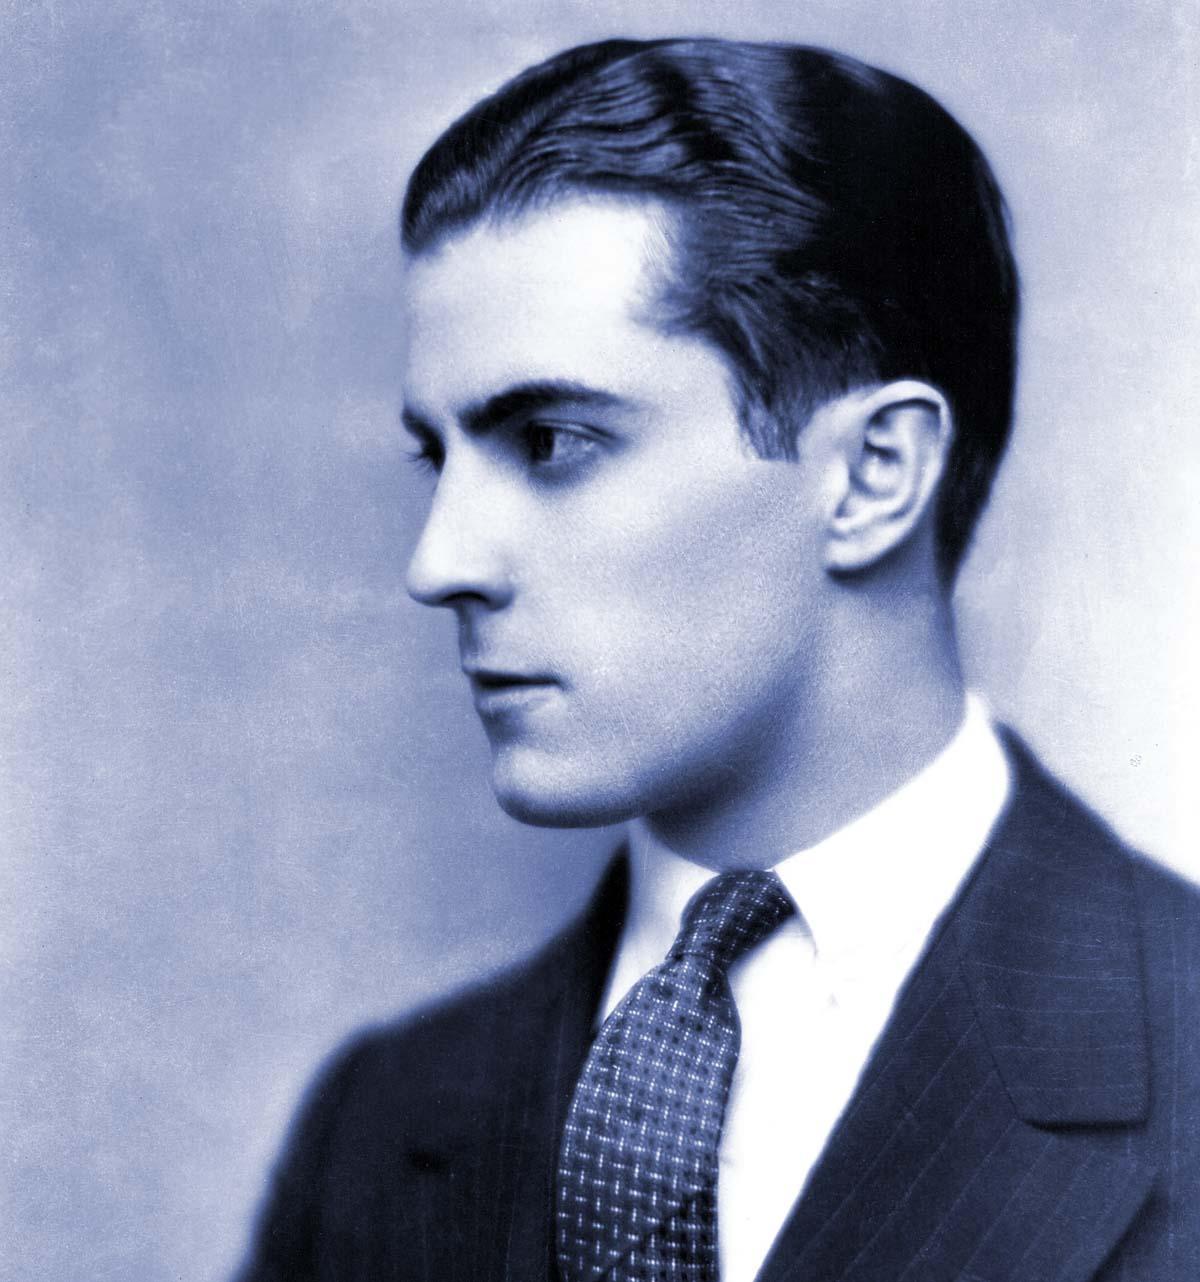 Ramon Novarro gay movie star